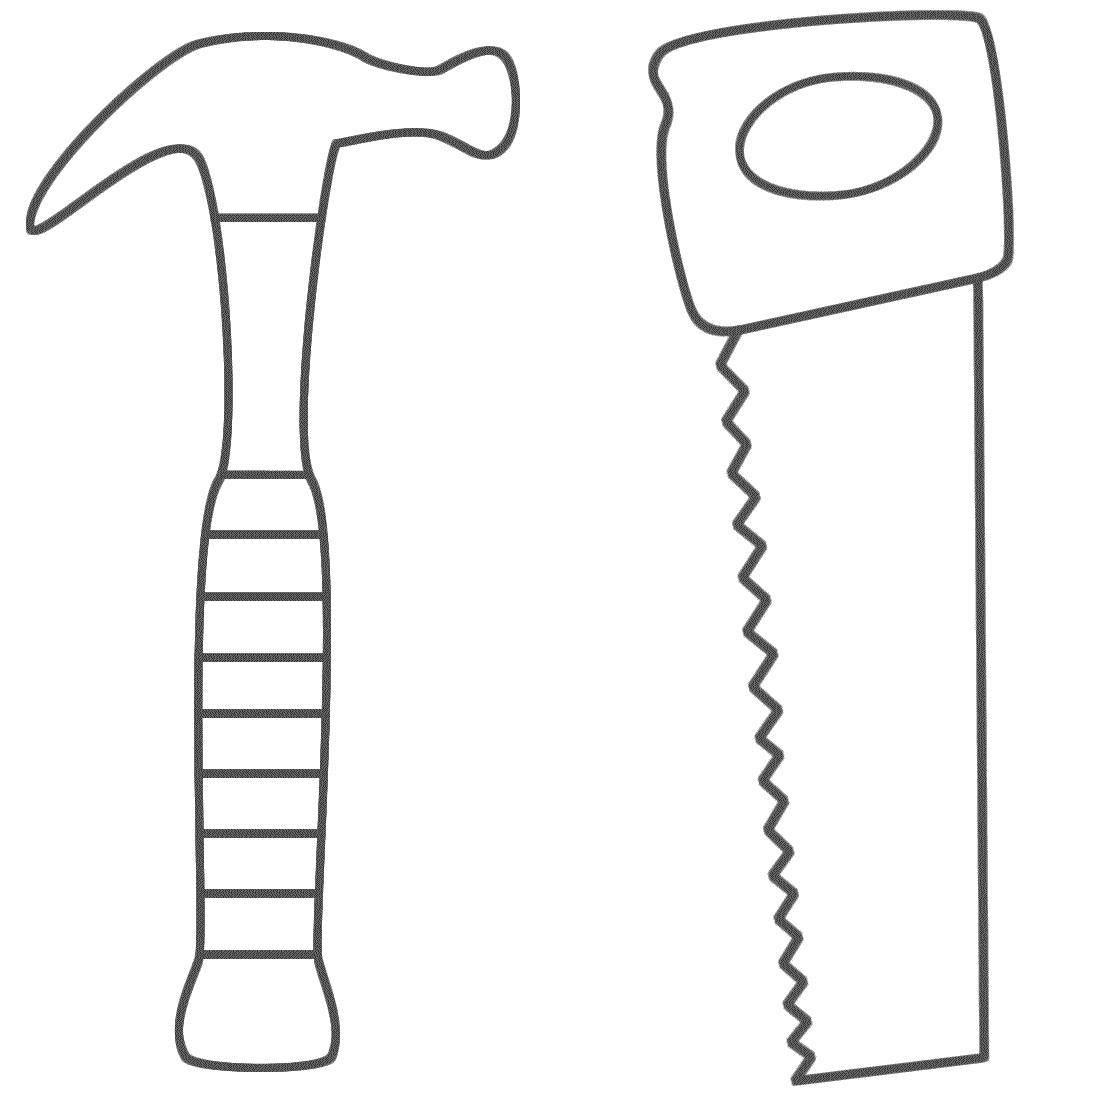 desenho de martelo e serrote para colorir tudodesenhos